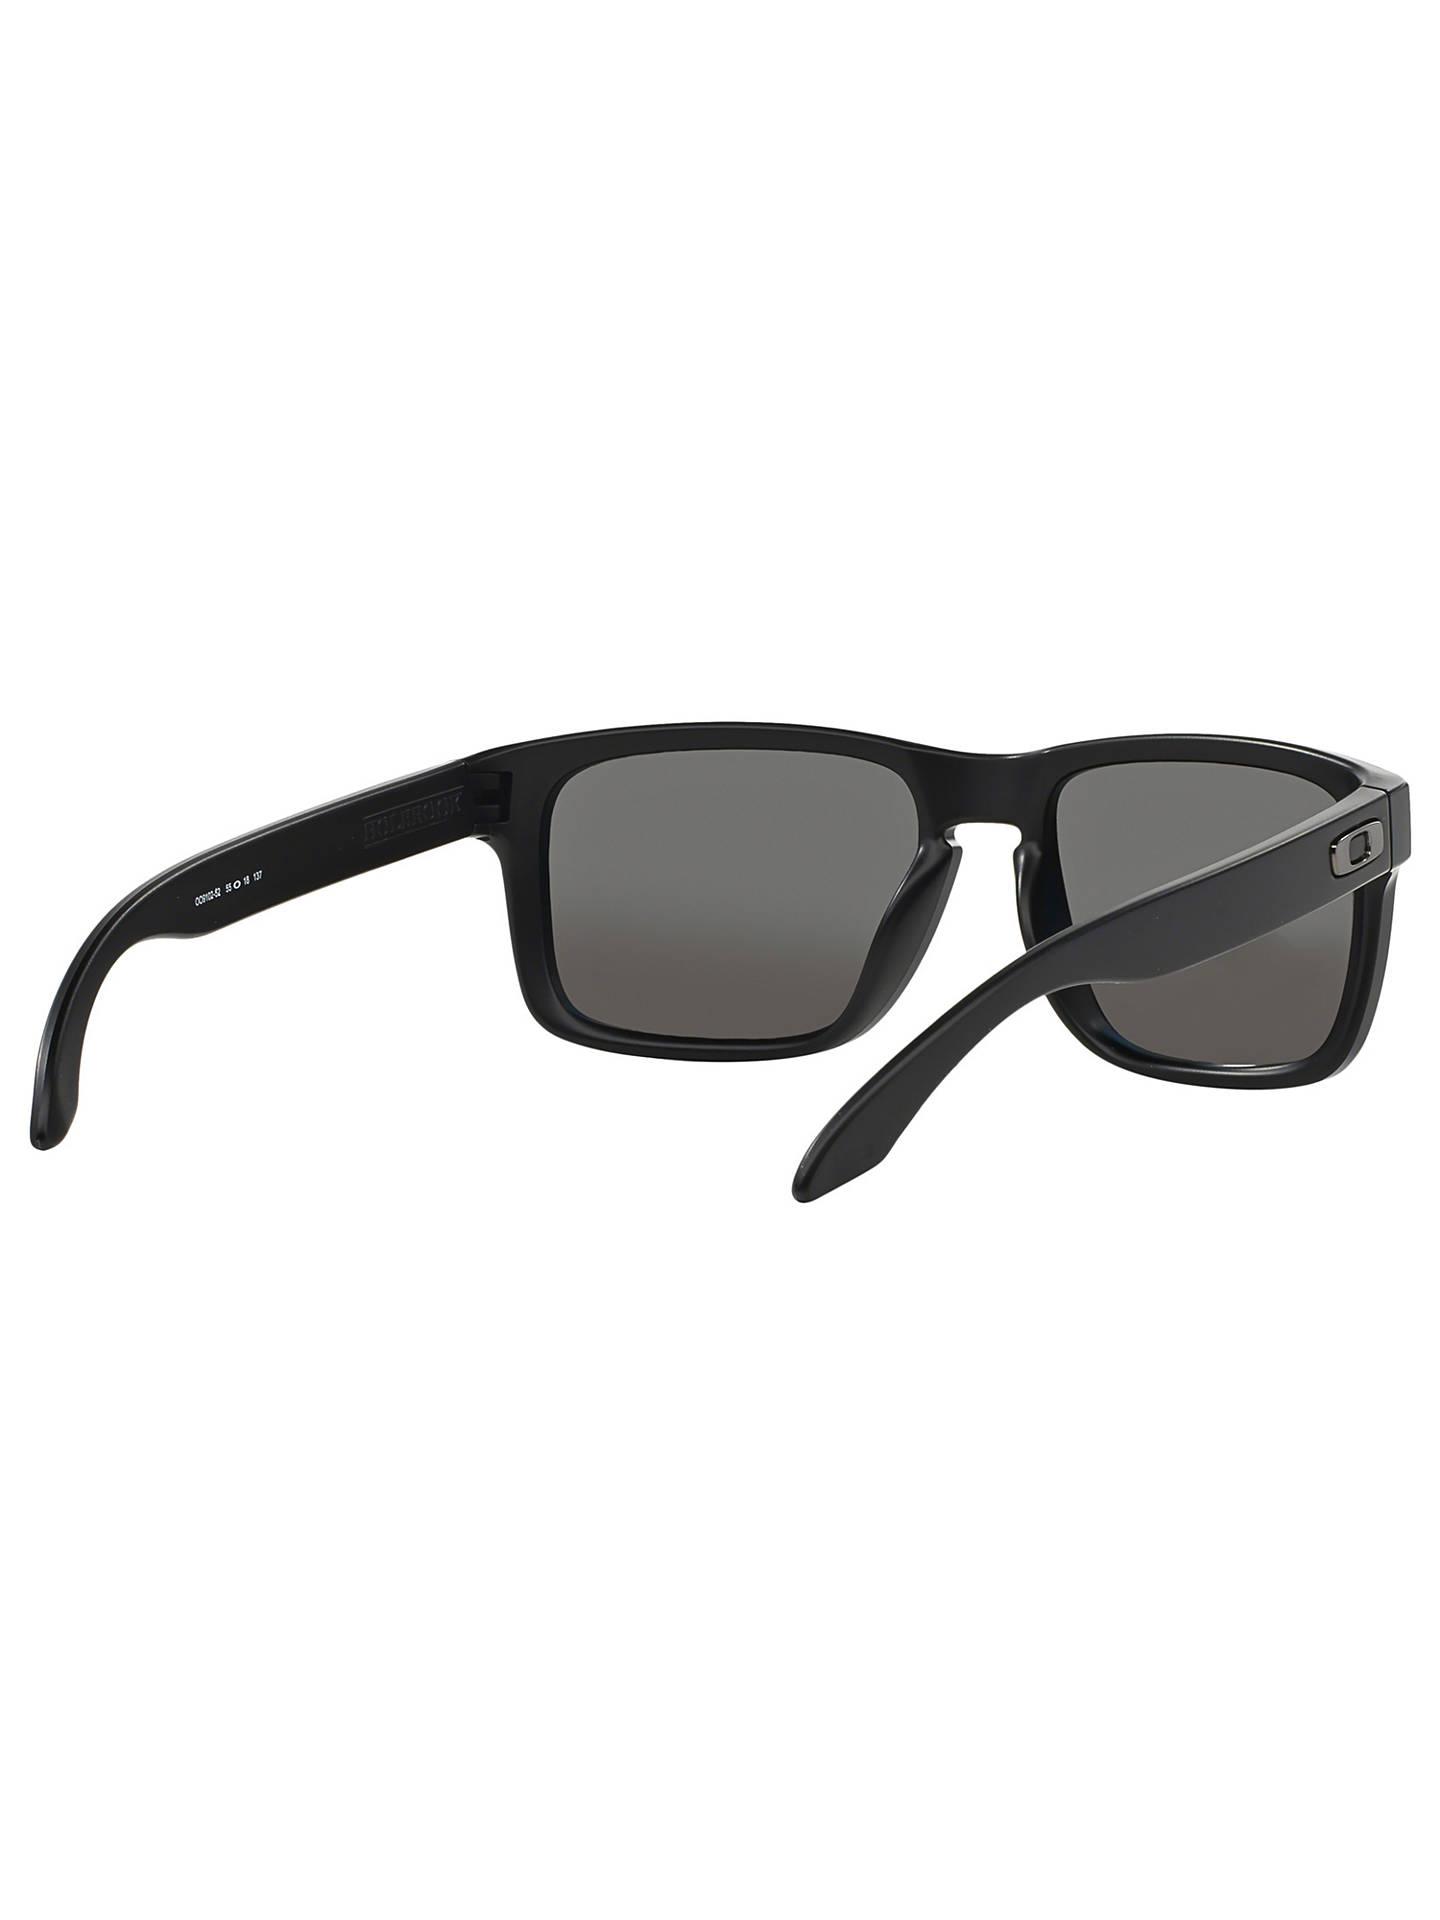 2aef1e2d7d Oakley OO9102 Holbrook Polarised Sunglasses at John Lewis   Partners